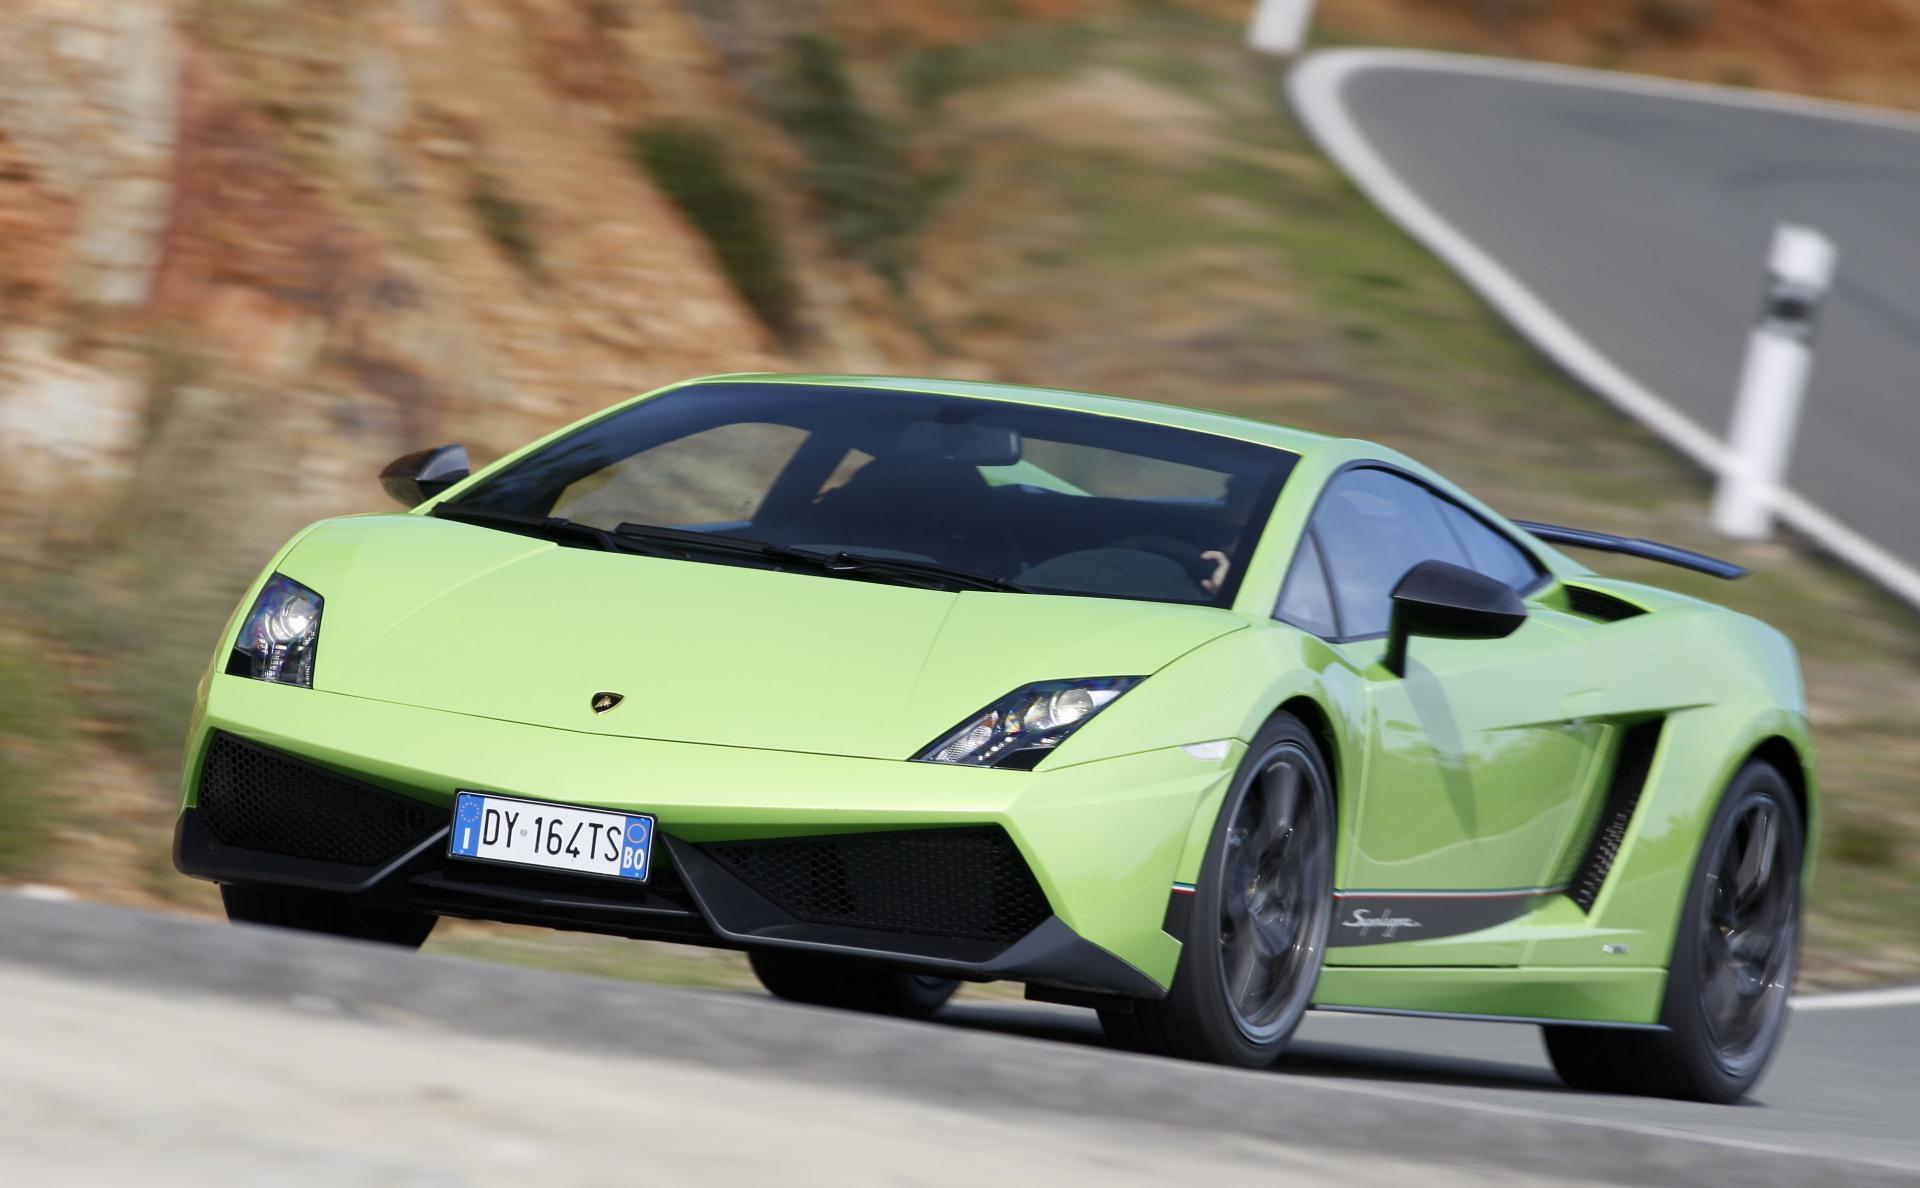 2010_Lamborghini_Gallardo_LP570-4_07